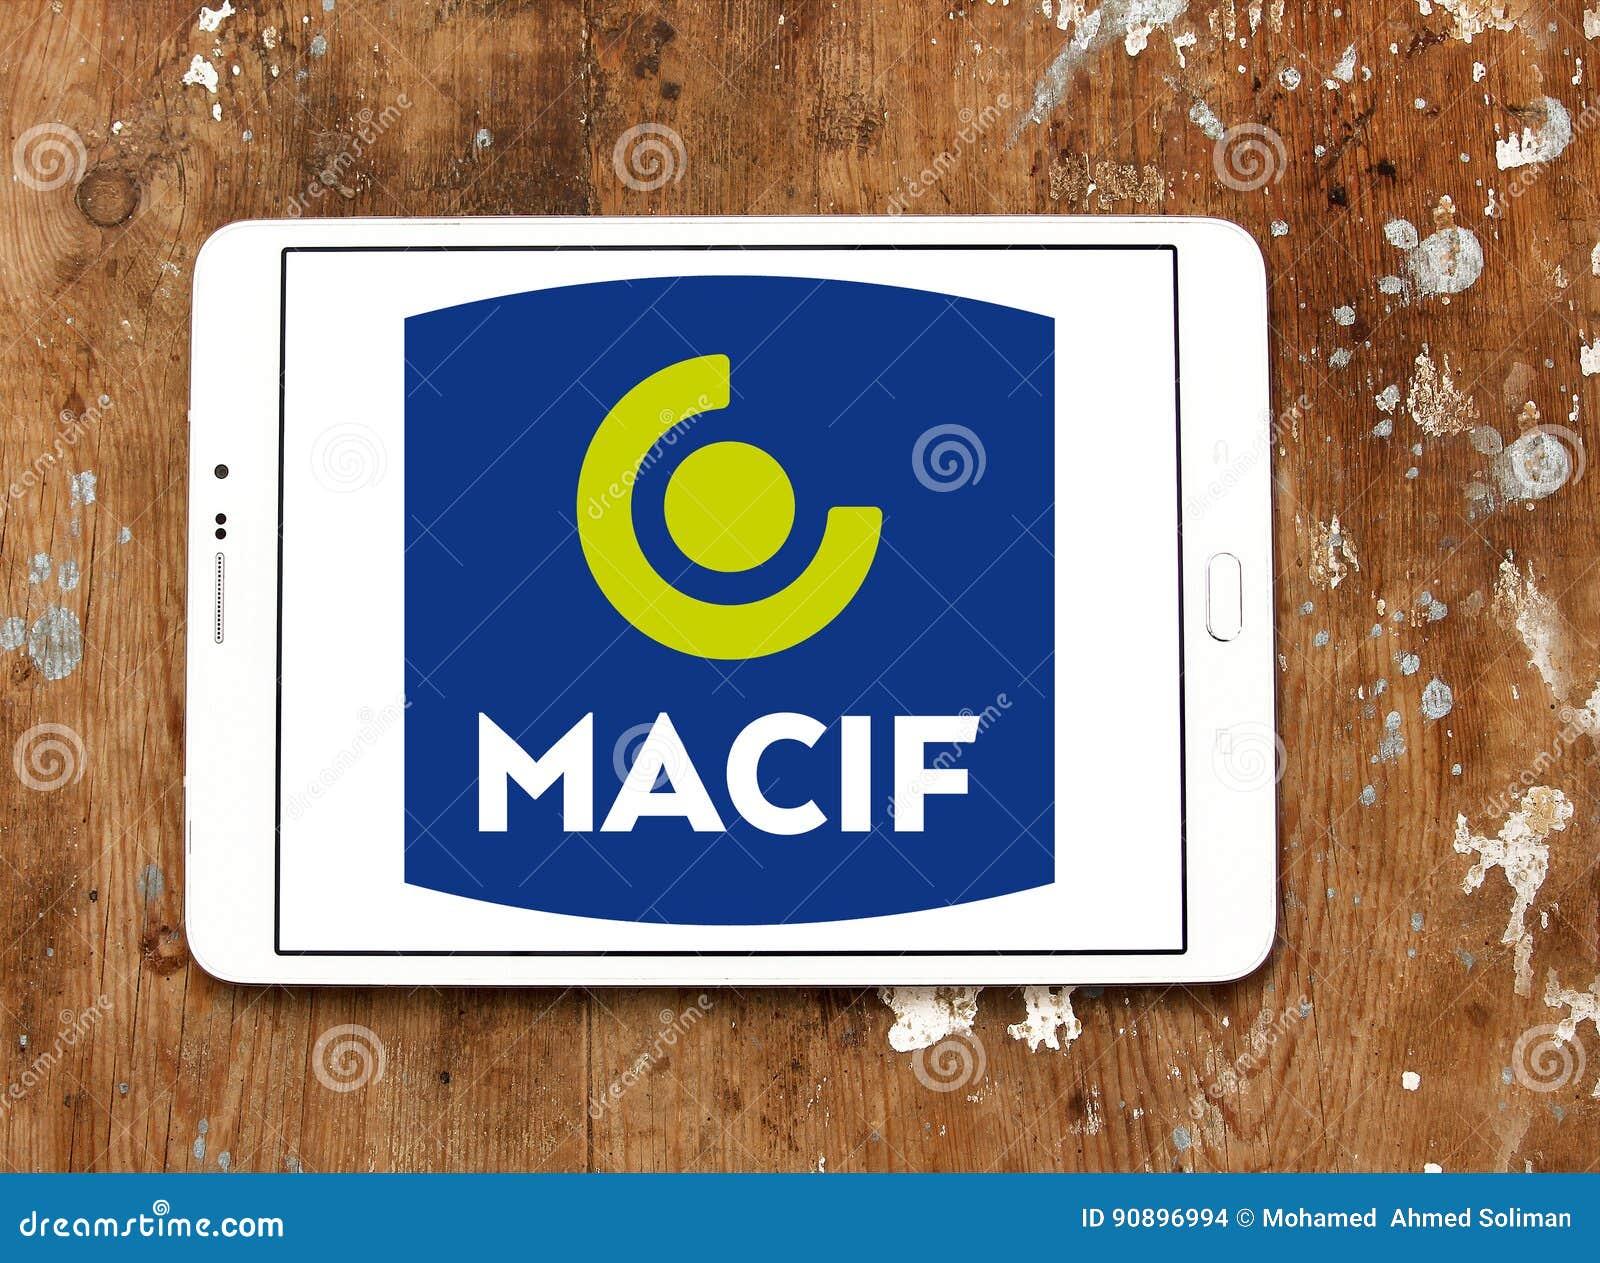 Macif Insurance Company Logo Editorial Stock Image Image Of Macif